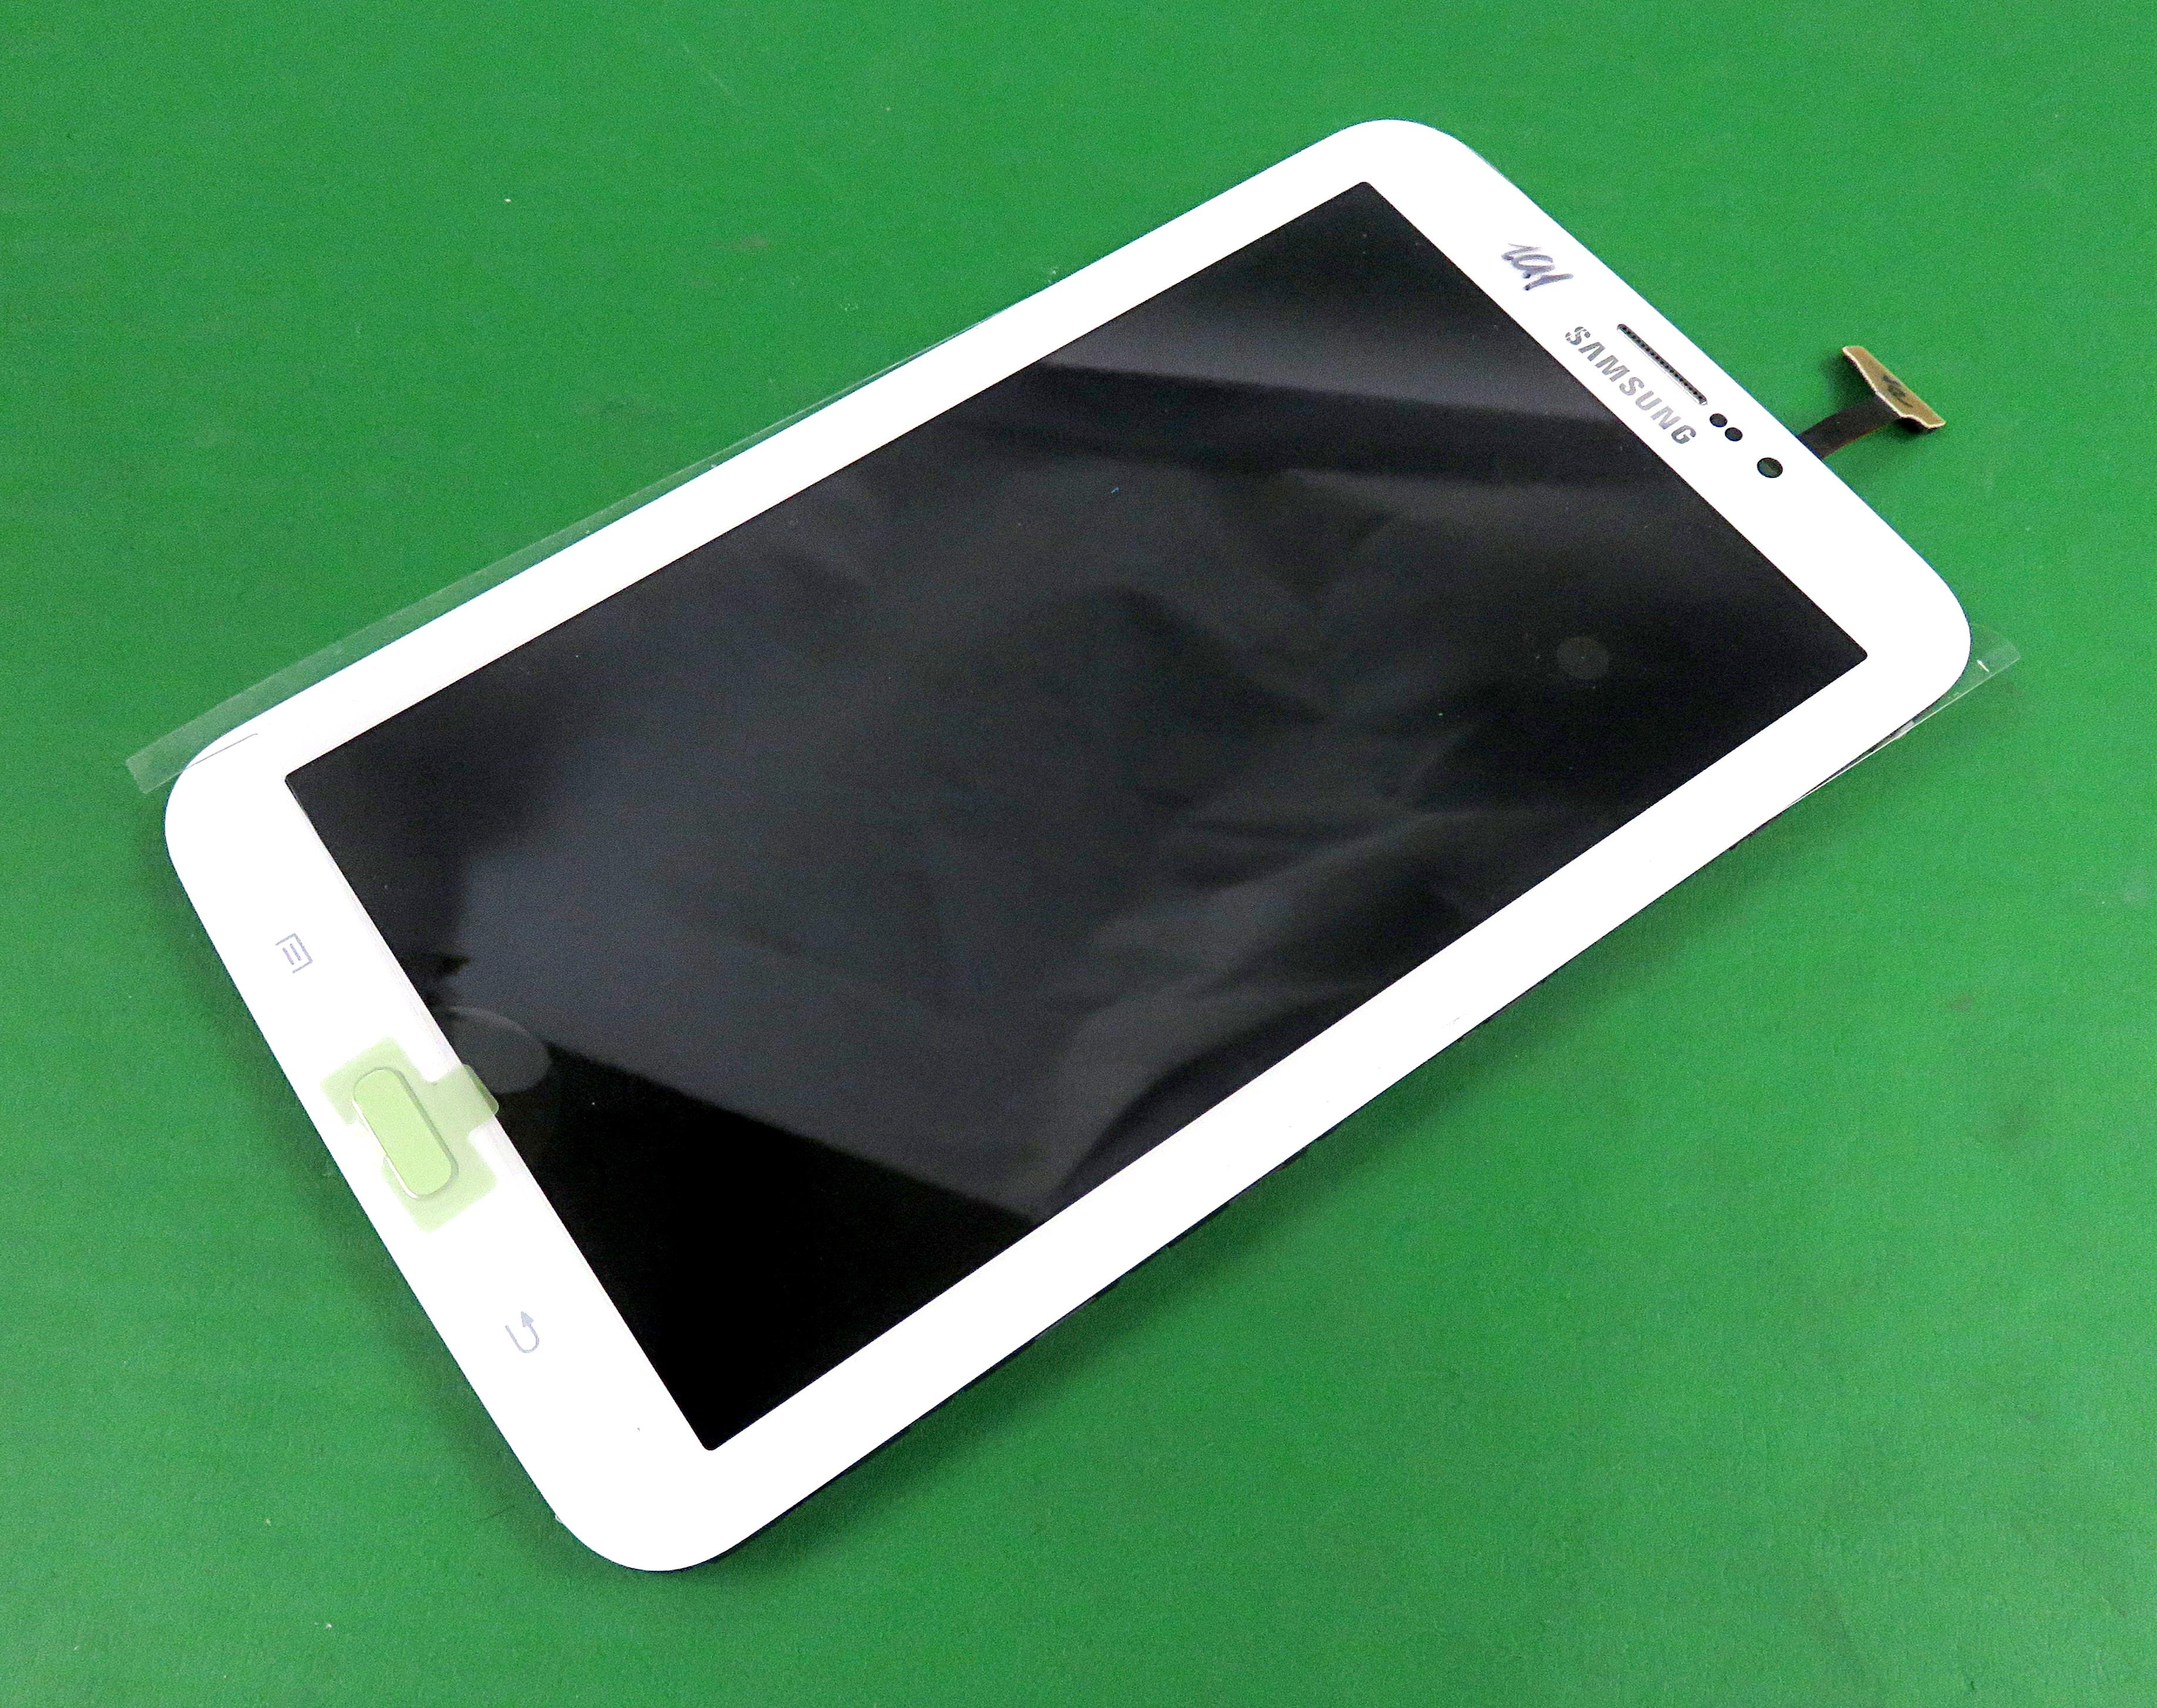 GH97-14816A Samsung Galaxy Tab 3 7.0 LCD, Touchpanel & Digitizer, White